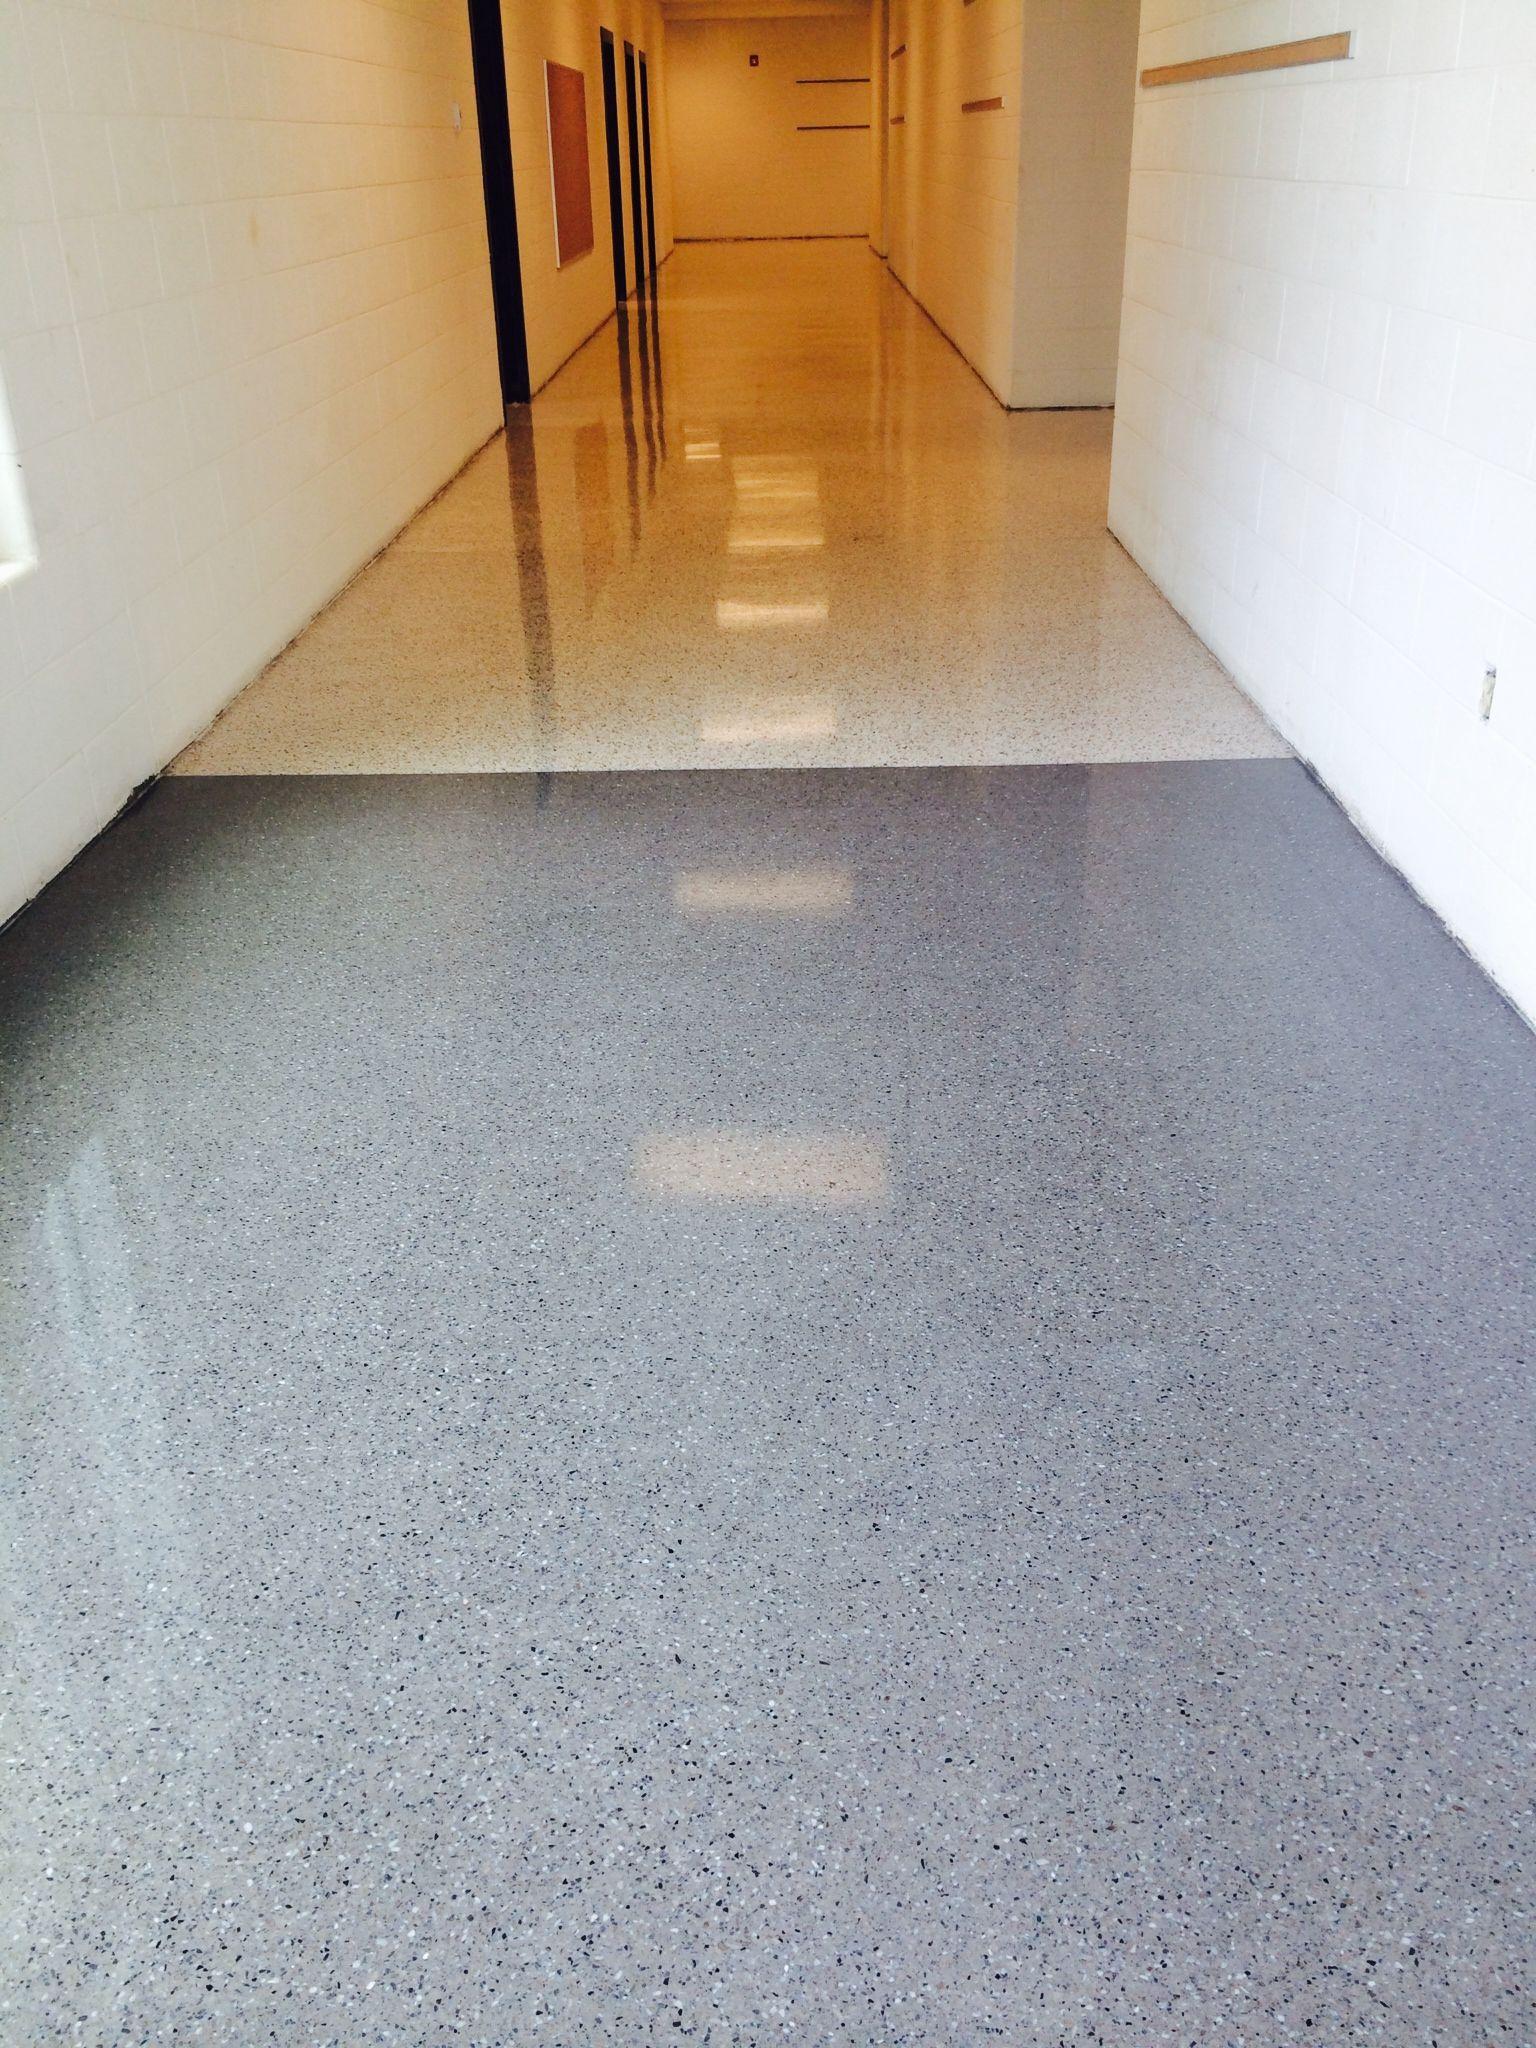 Epoxy Terrazzo Is A 1 4 Or 3 8 Inch Thin Set Flooring